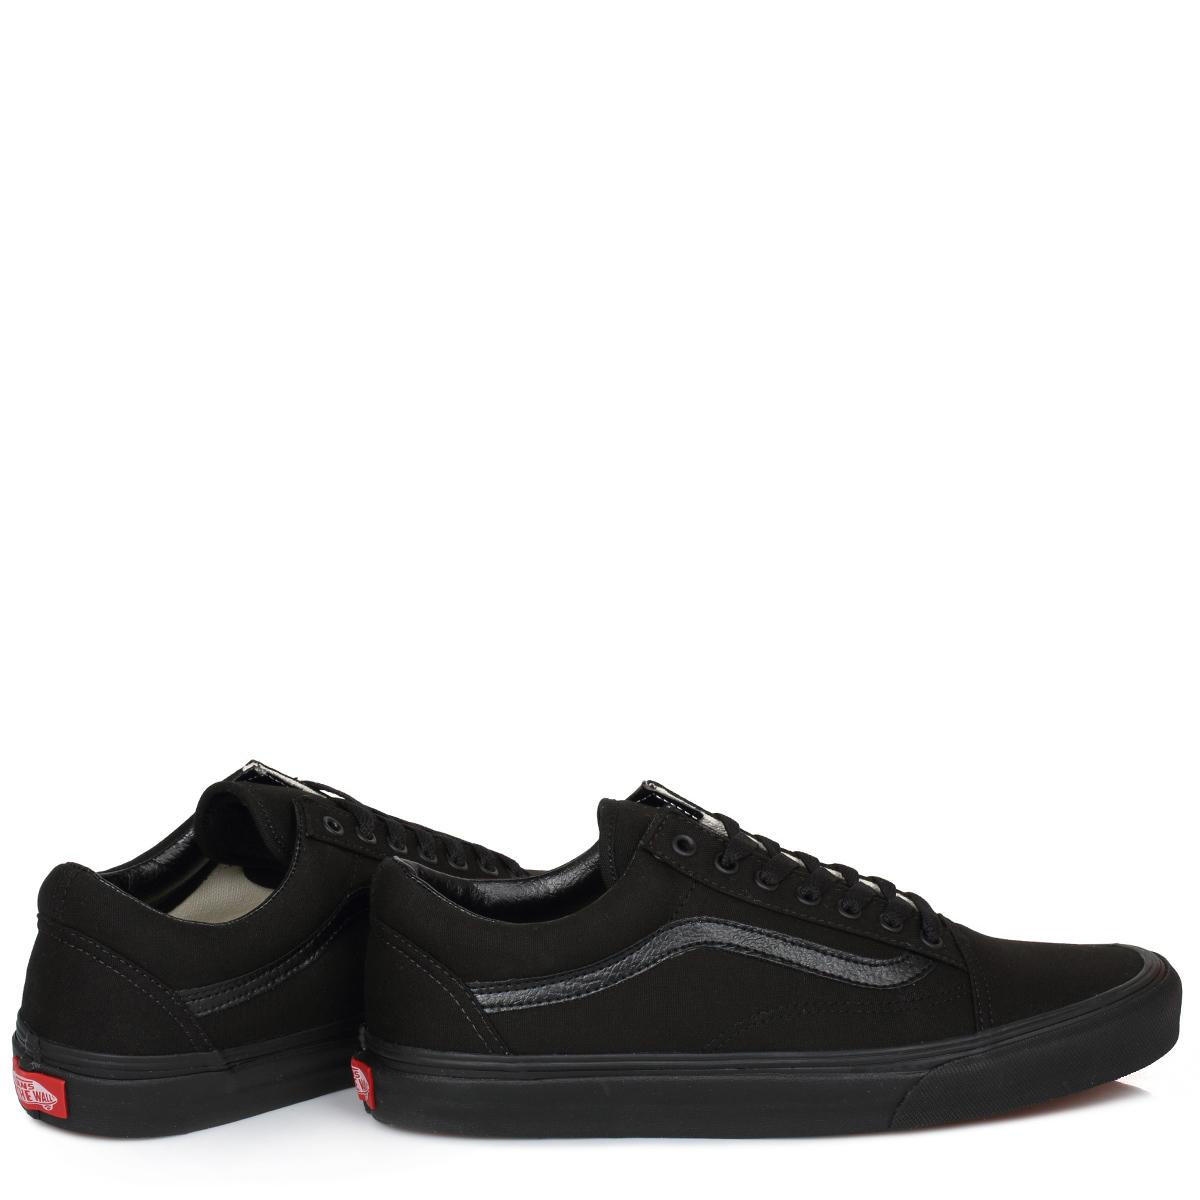 Black Skate Shoes Women Uk